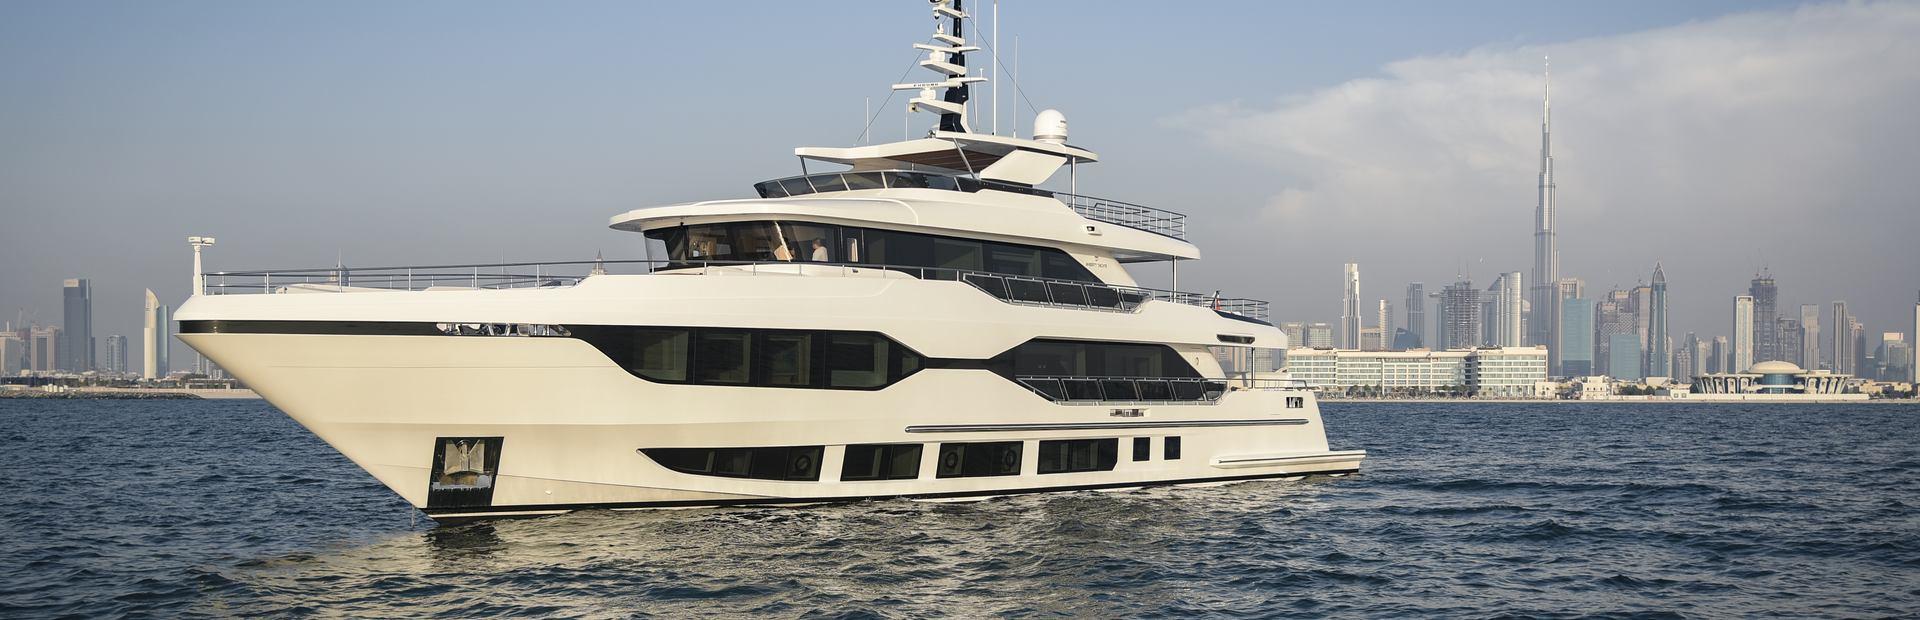 Majesty 120 Yacht Charter